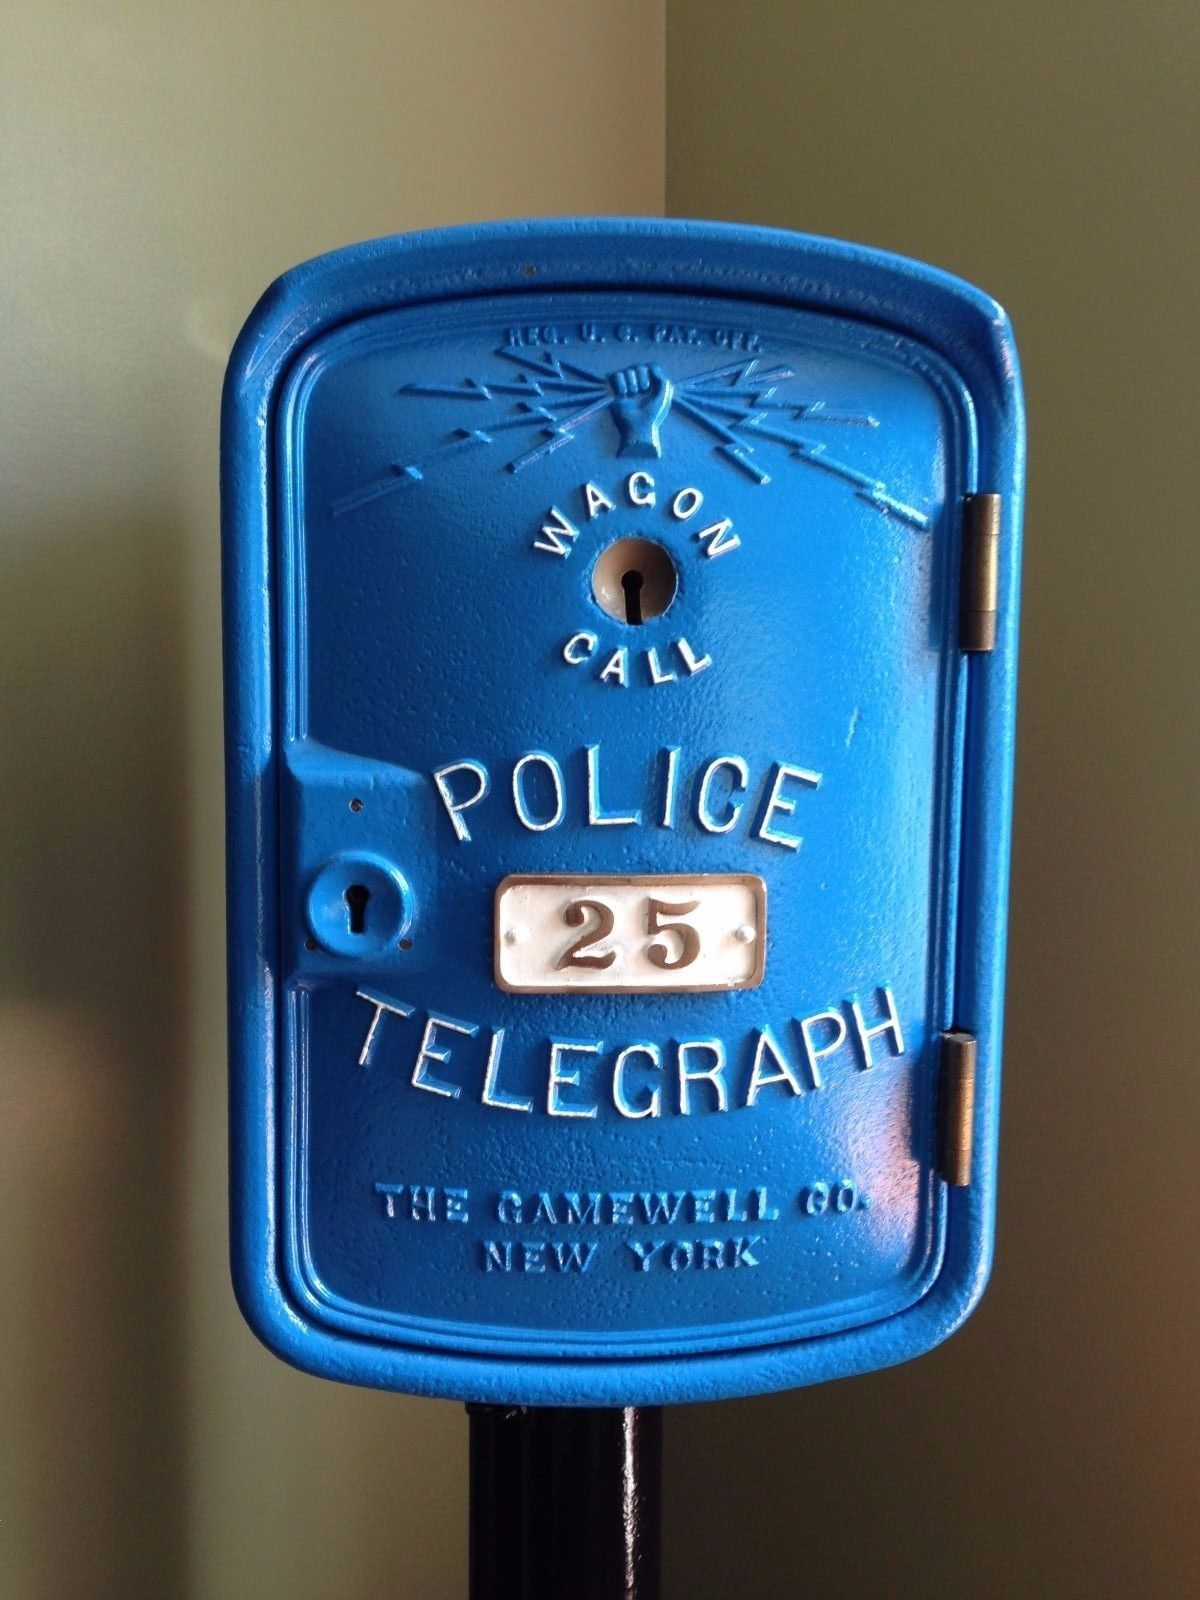 Gamewell Wagon Call Police Fire Alarm Telegraph